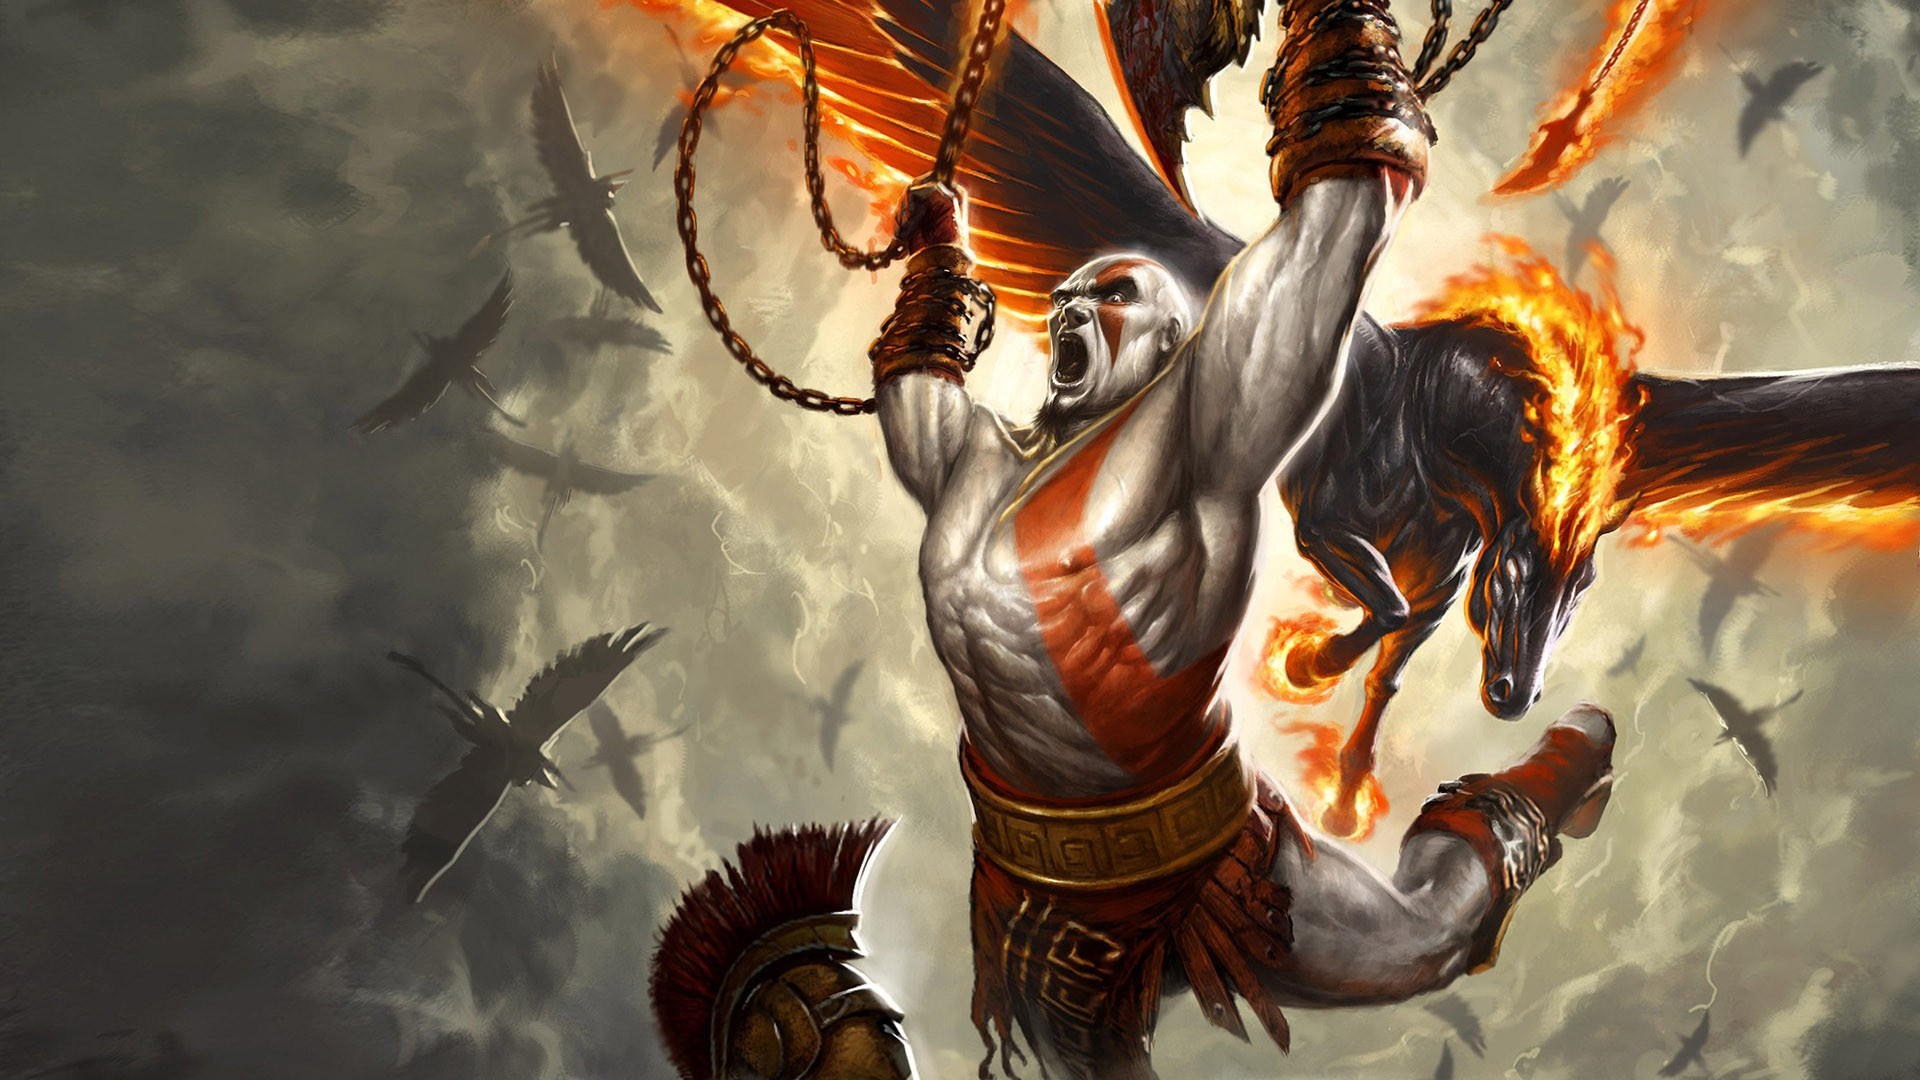 More hd wallpapers download god of war full